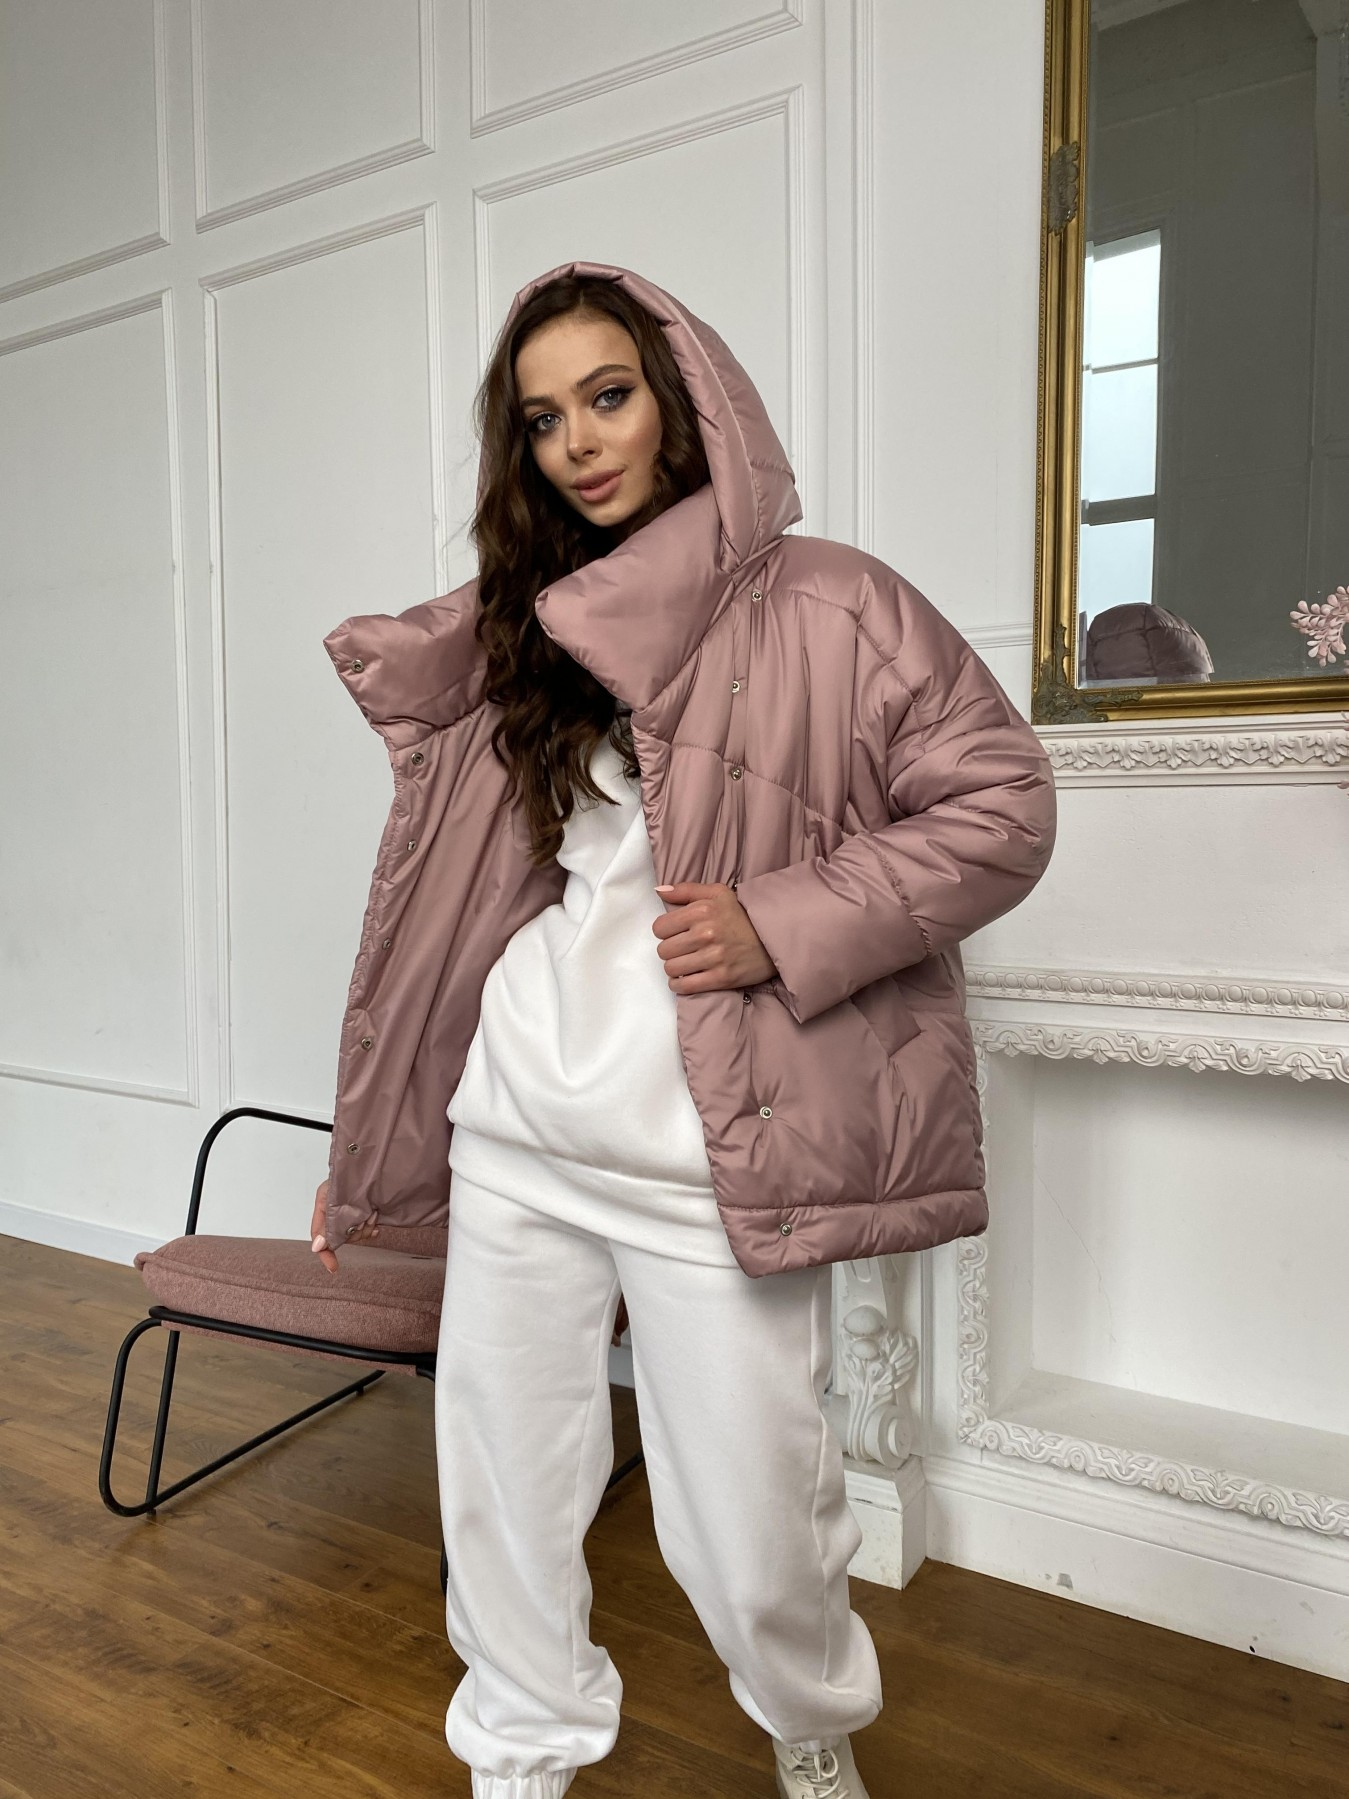 Уно куртка плащевка Ammy 10671 АРТ. 47409 Цвет: Пудра - фото 6, интернет магазин tm-modus.ru